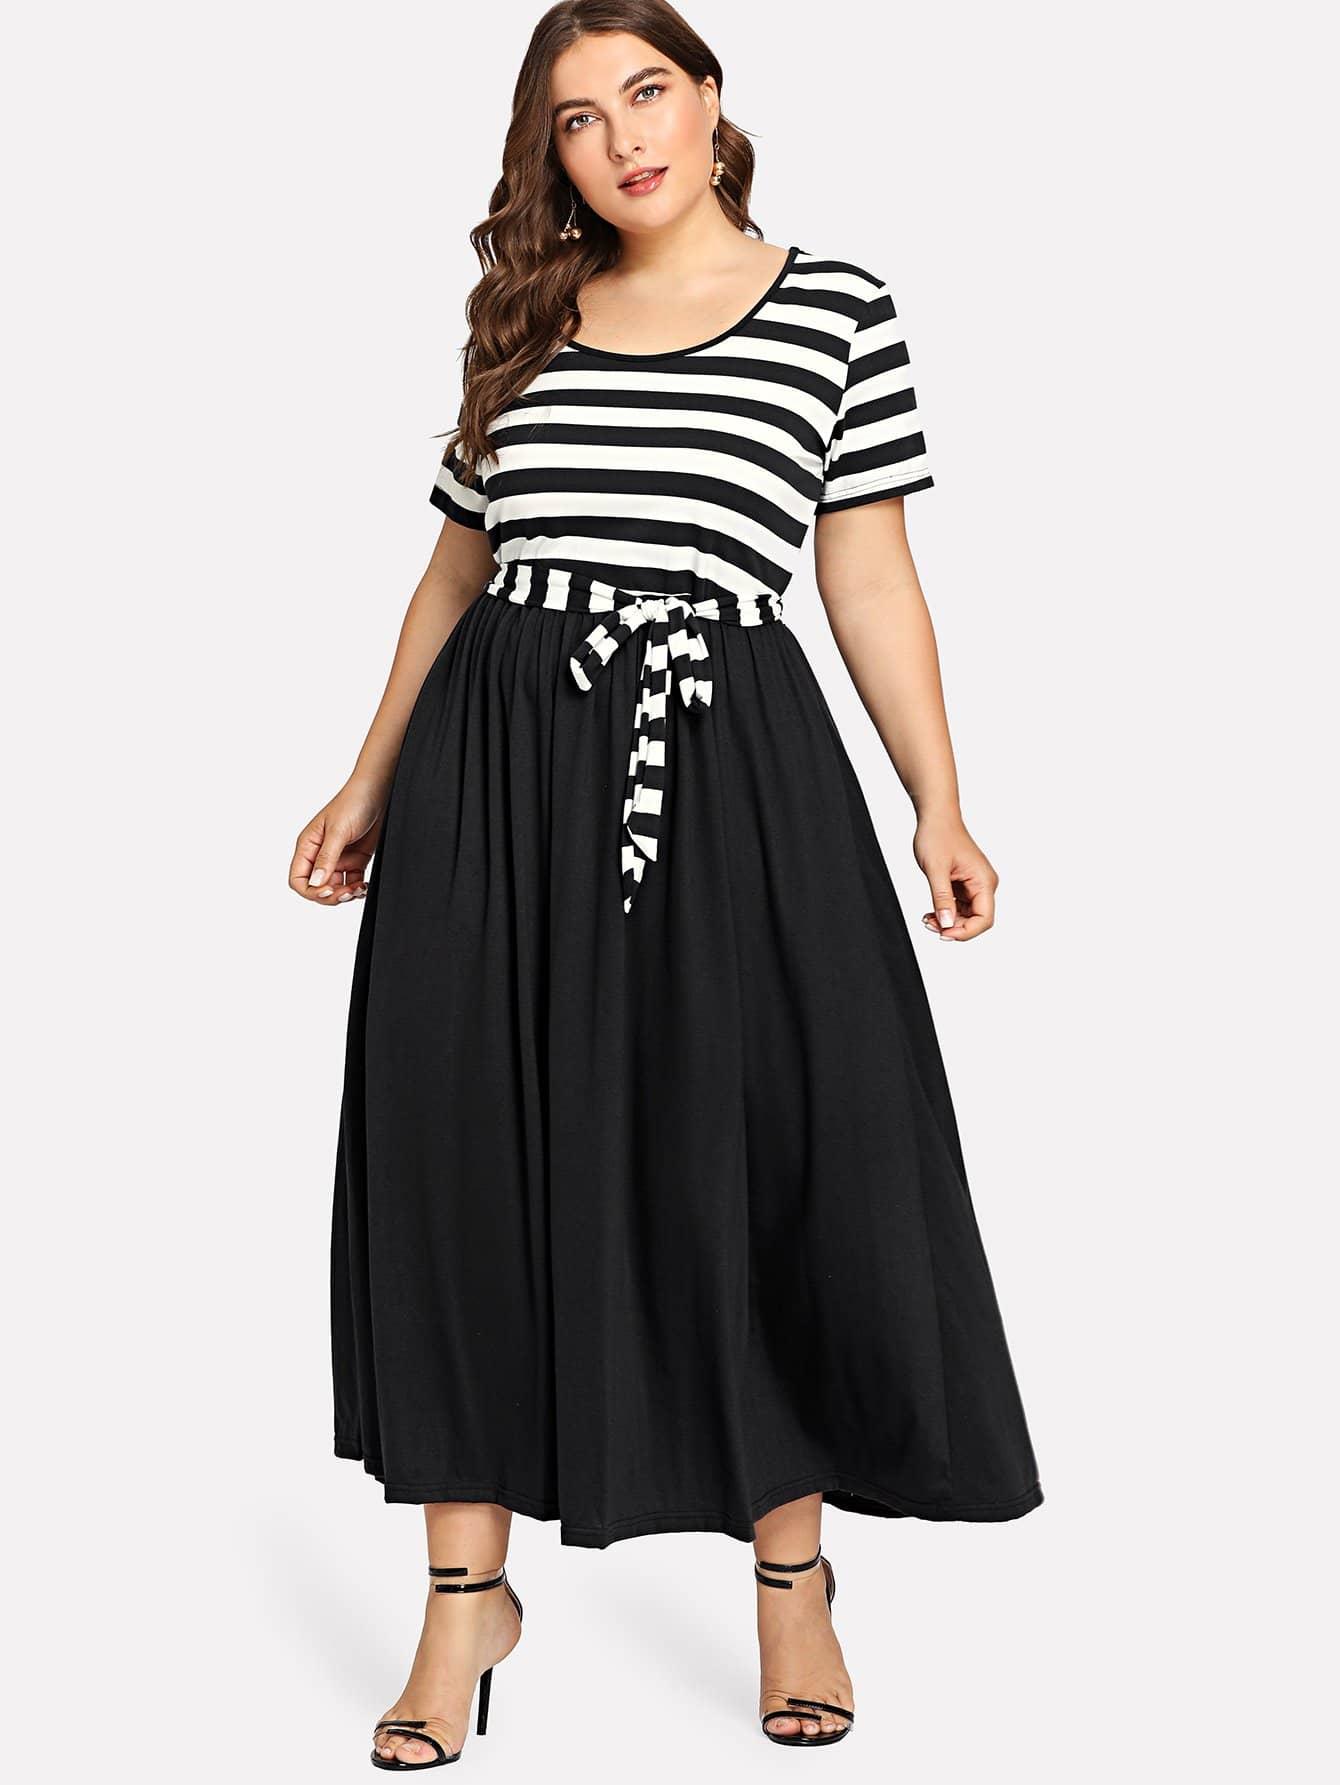 Striped Bodice Belted Dress striped pockets belted pencil dress